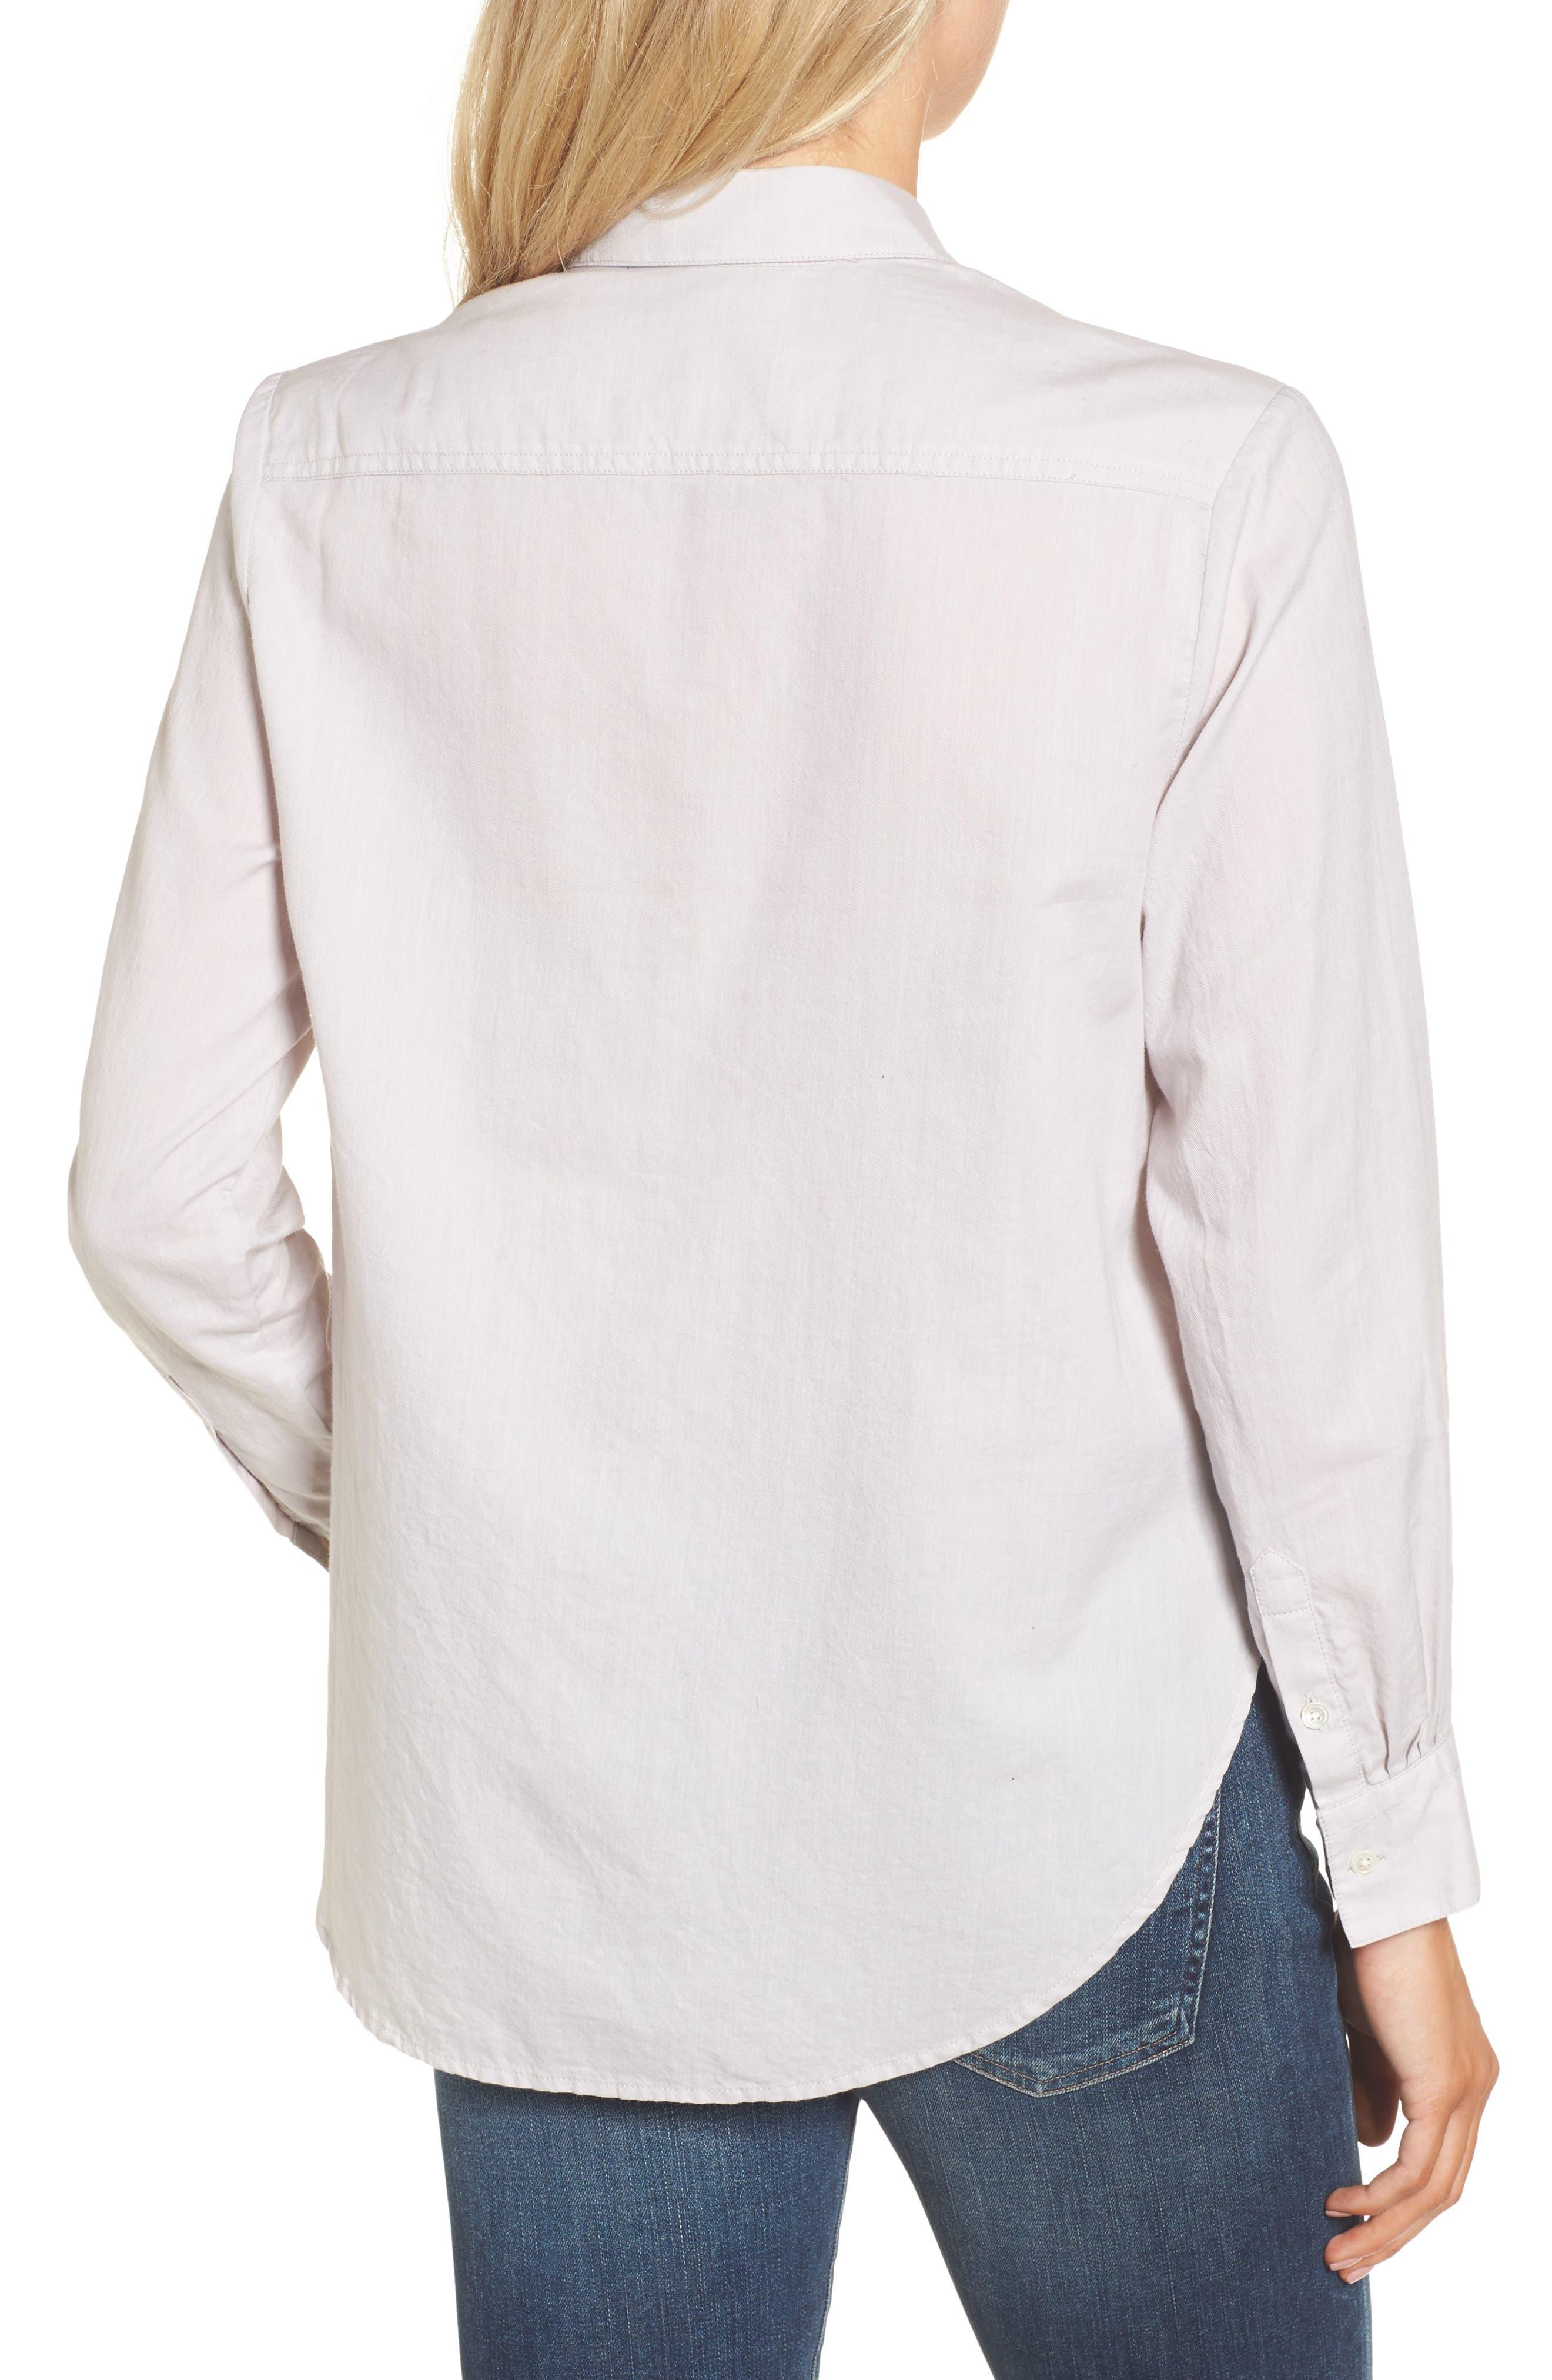 Little Boy Shirt,                             Alternate thumbnail 2, color,                             026